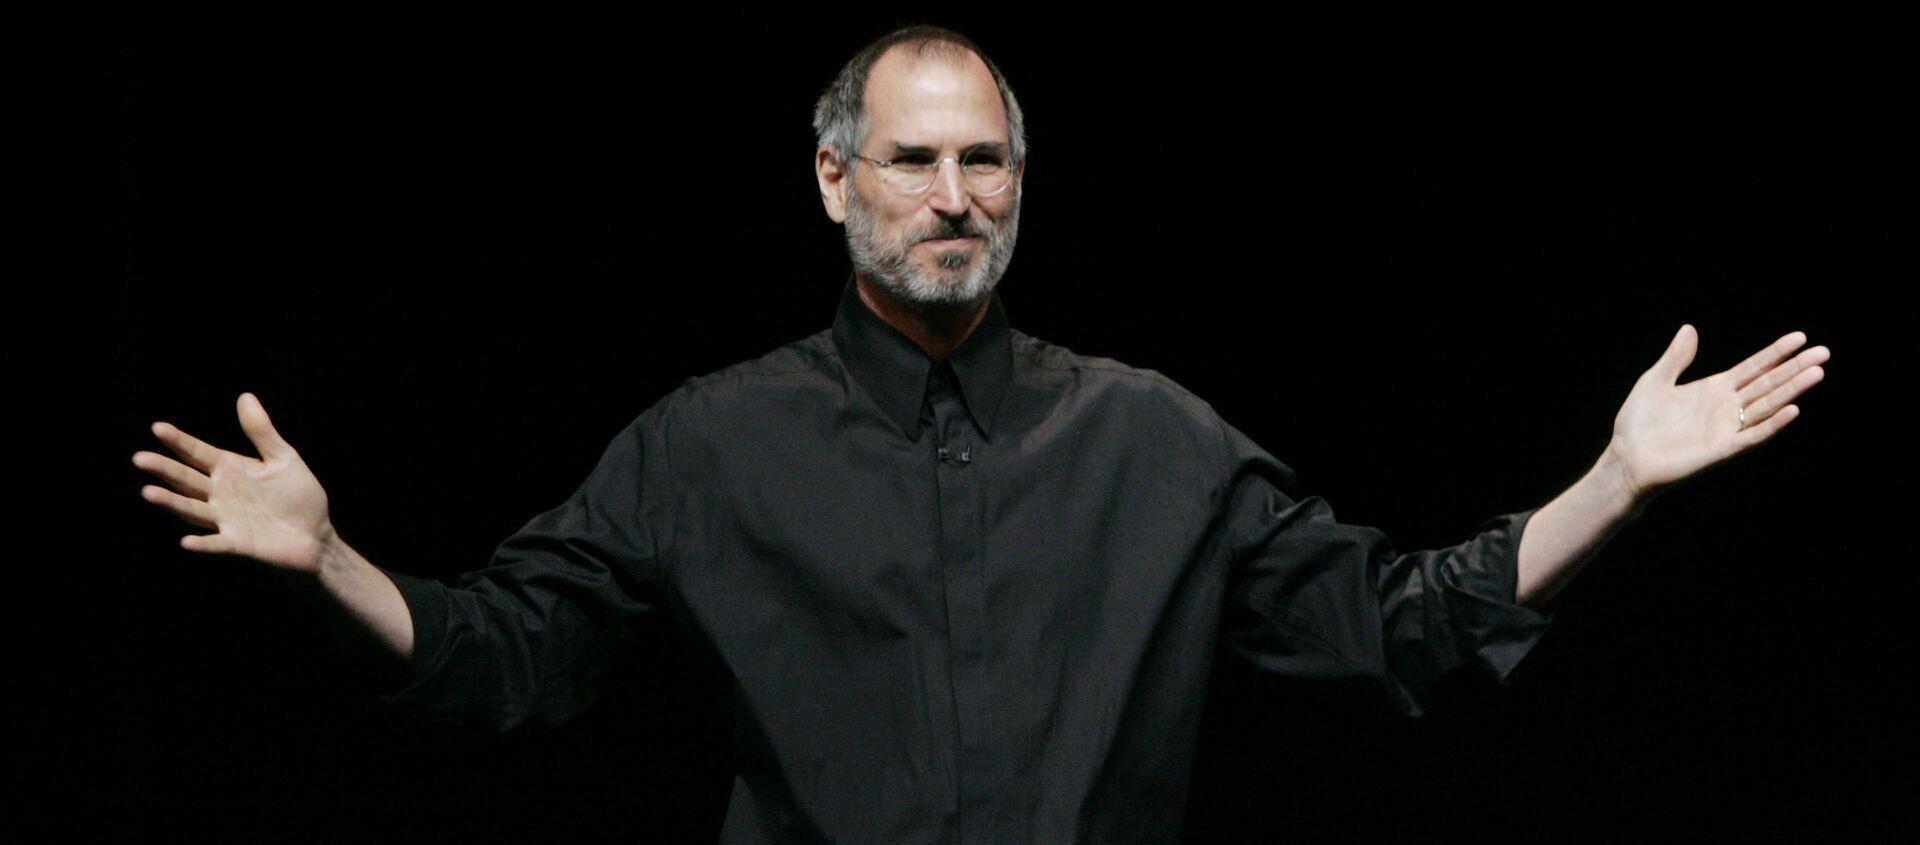 Steve Jobs, cofundador de Apple - Sputnik Mundo, 1920, 03.01.2021